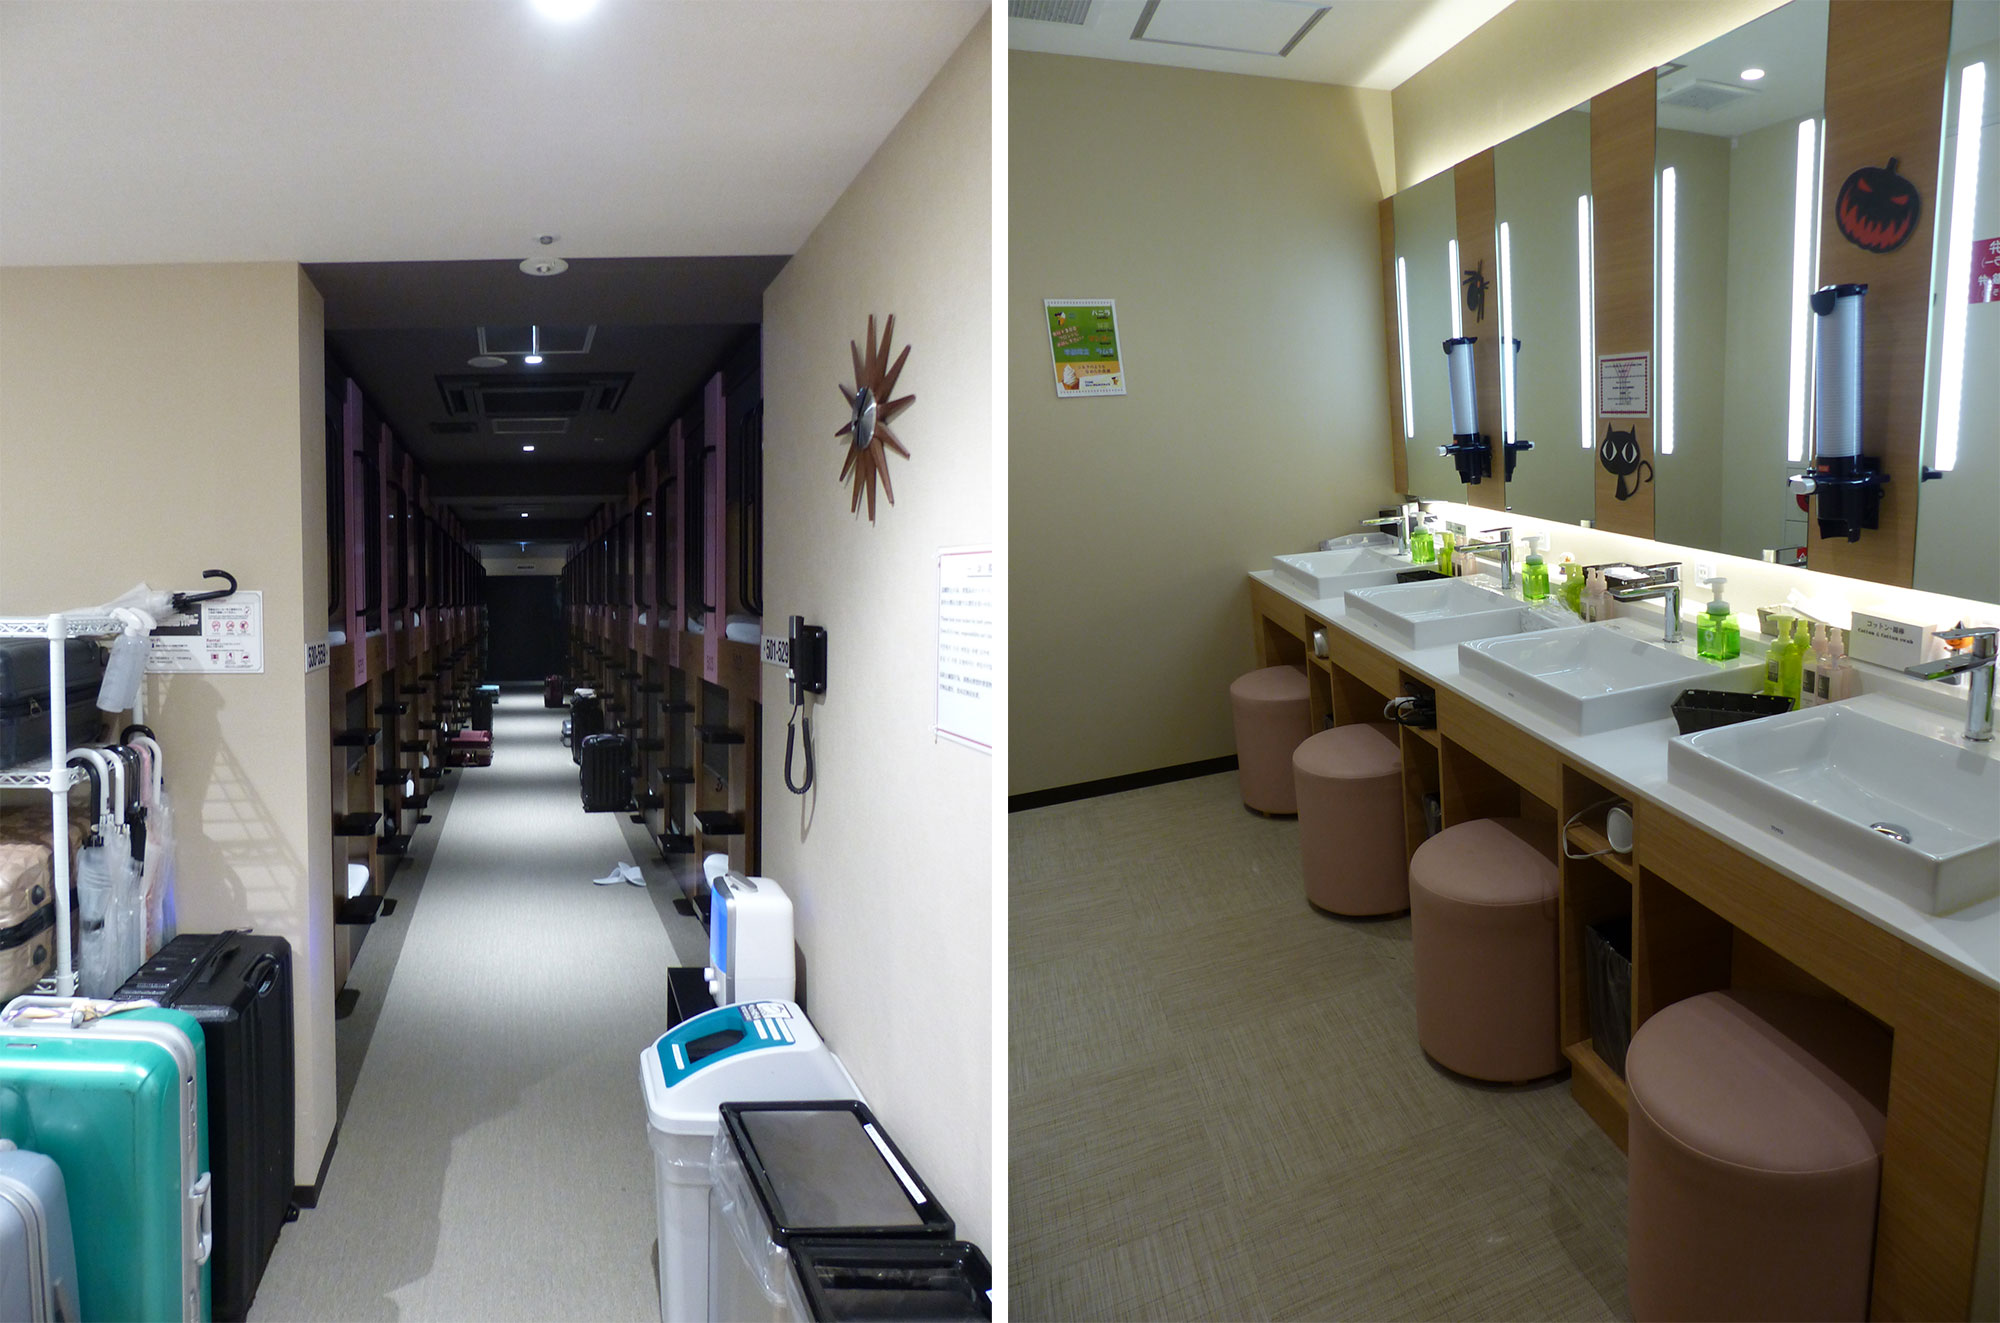 Osaka, hôtel cabine - Autour de Marine